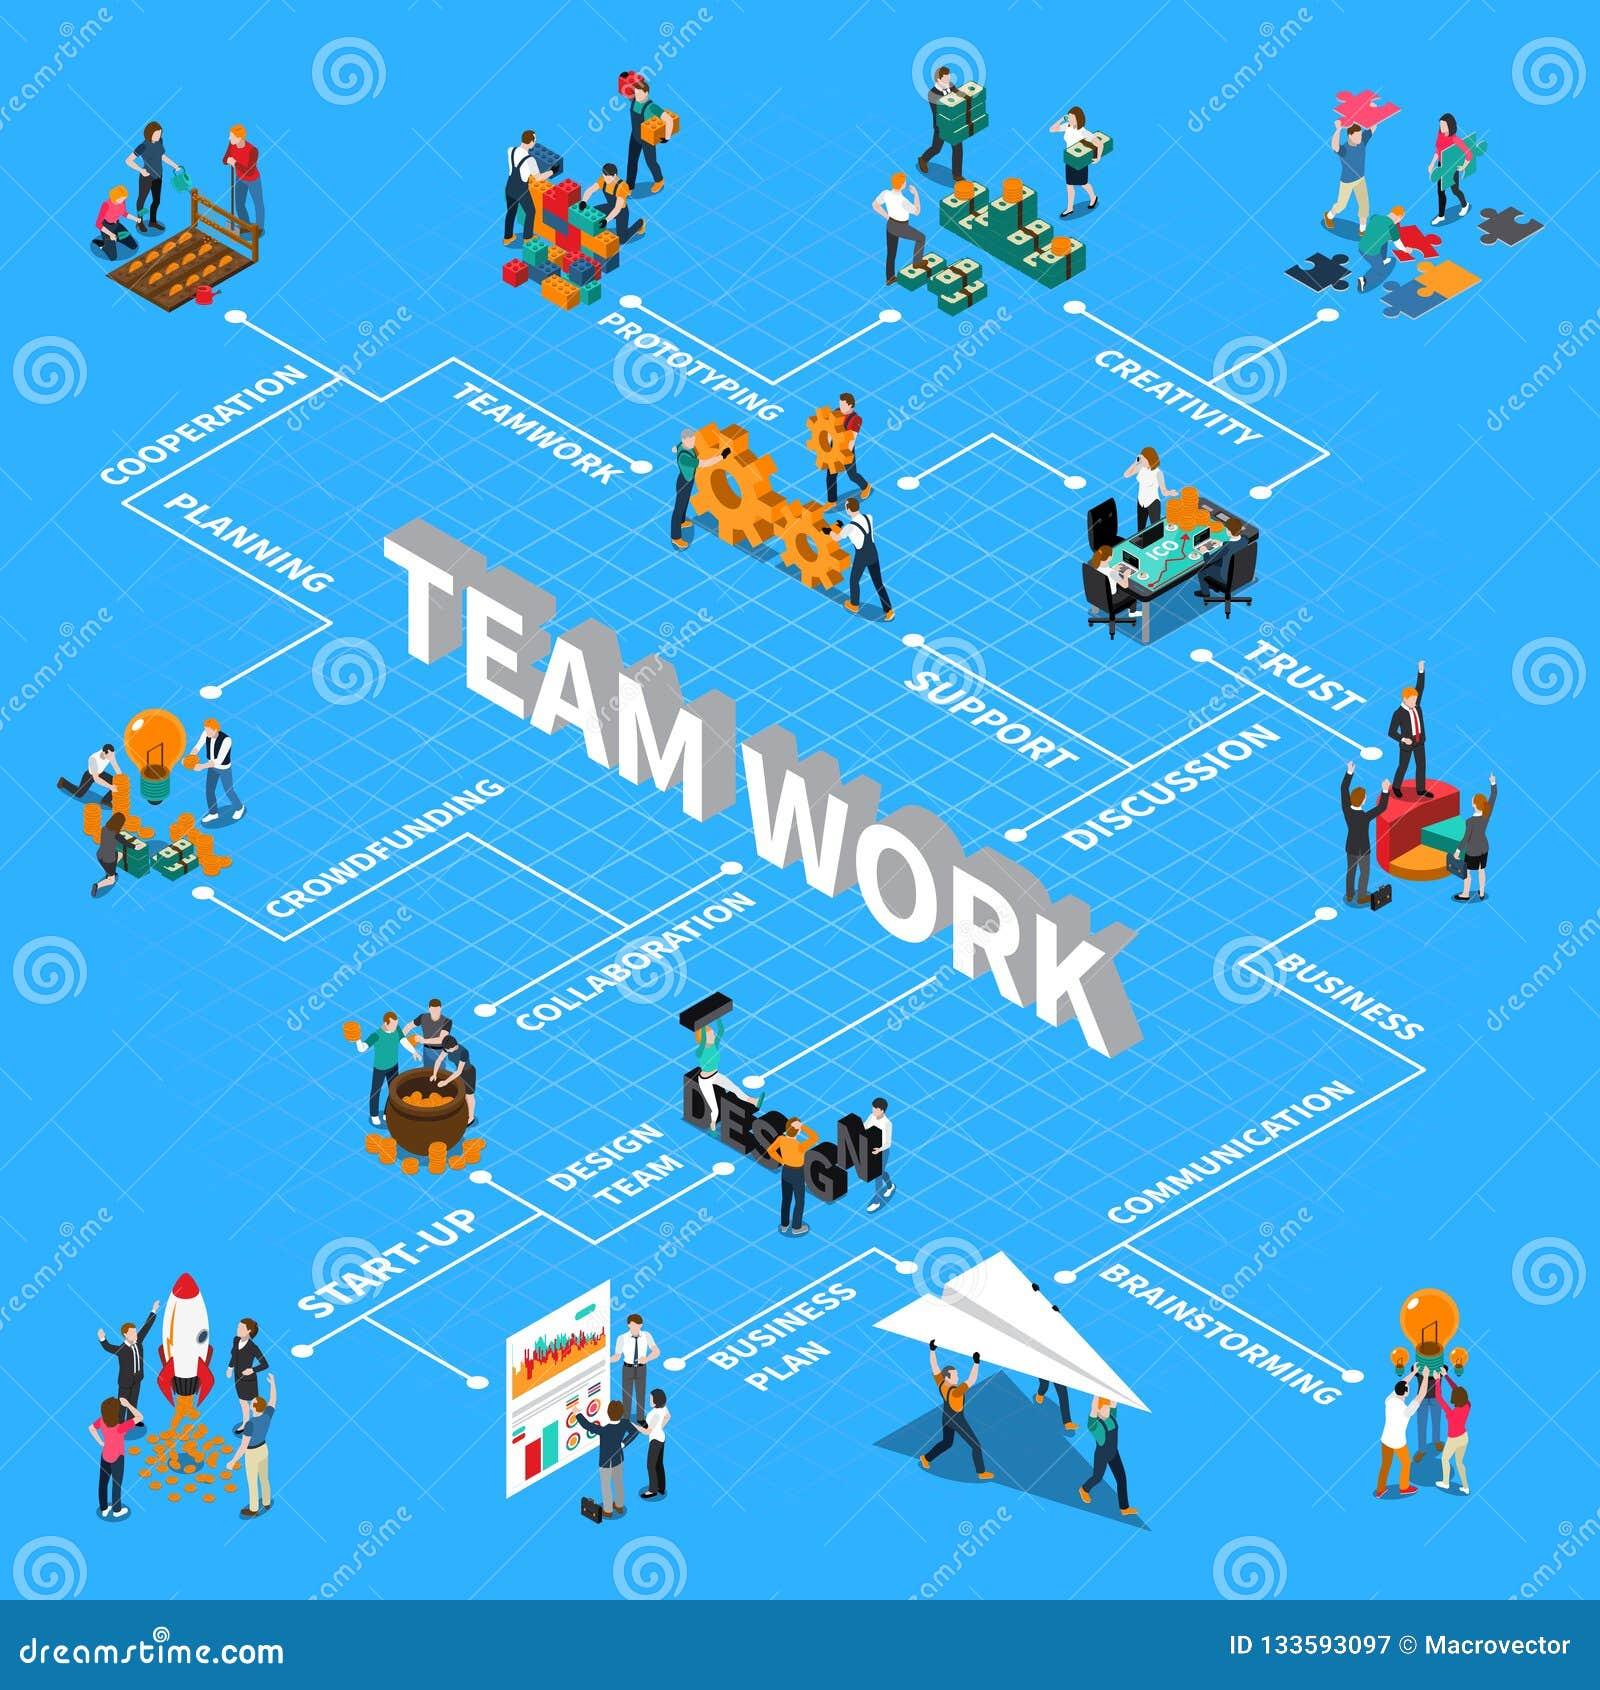 Teamwork Isometric Flowchart